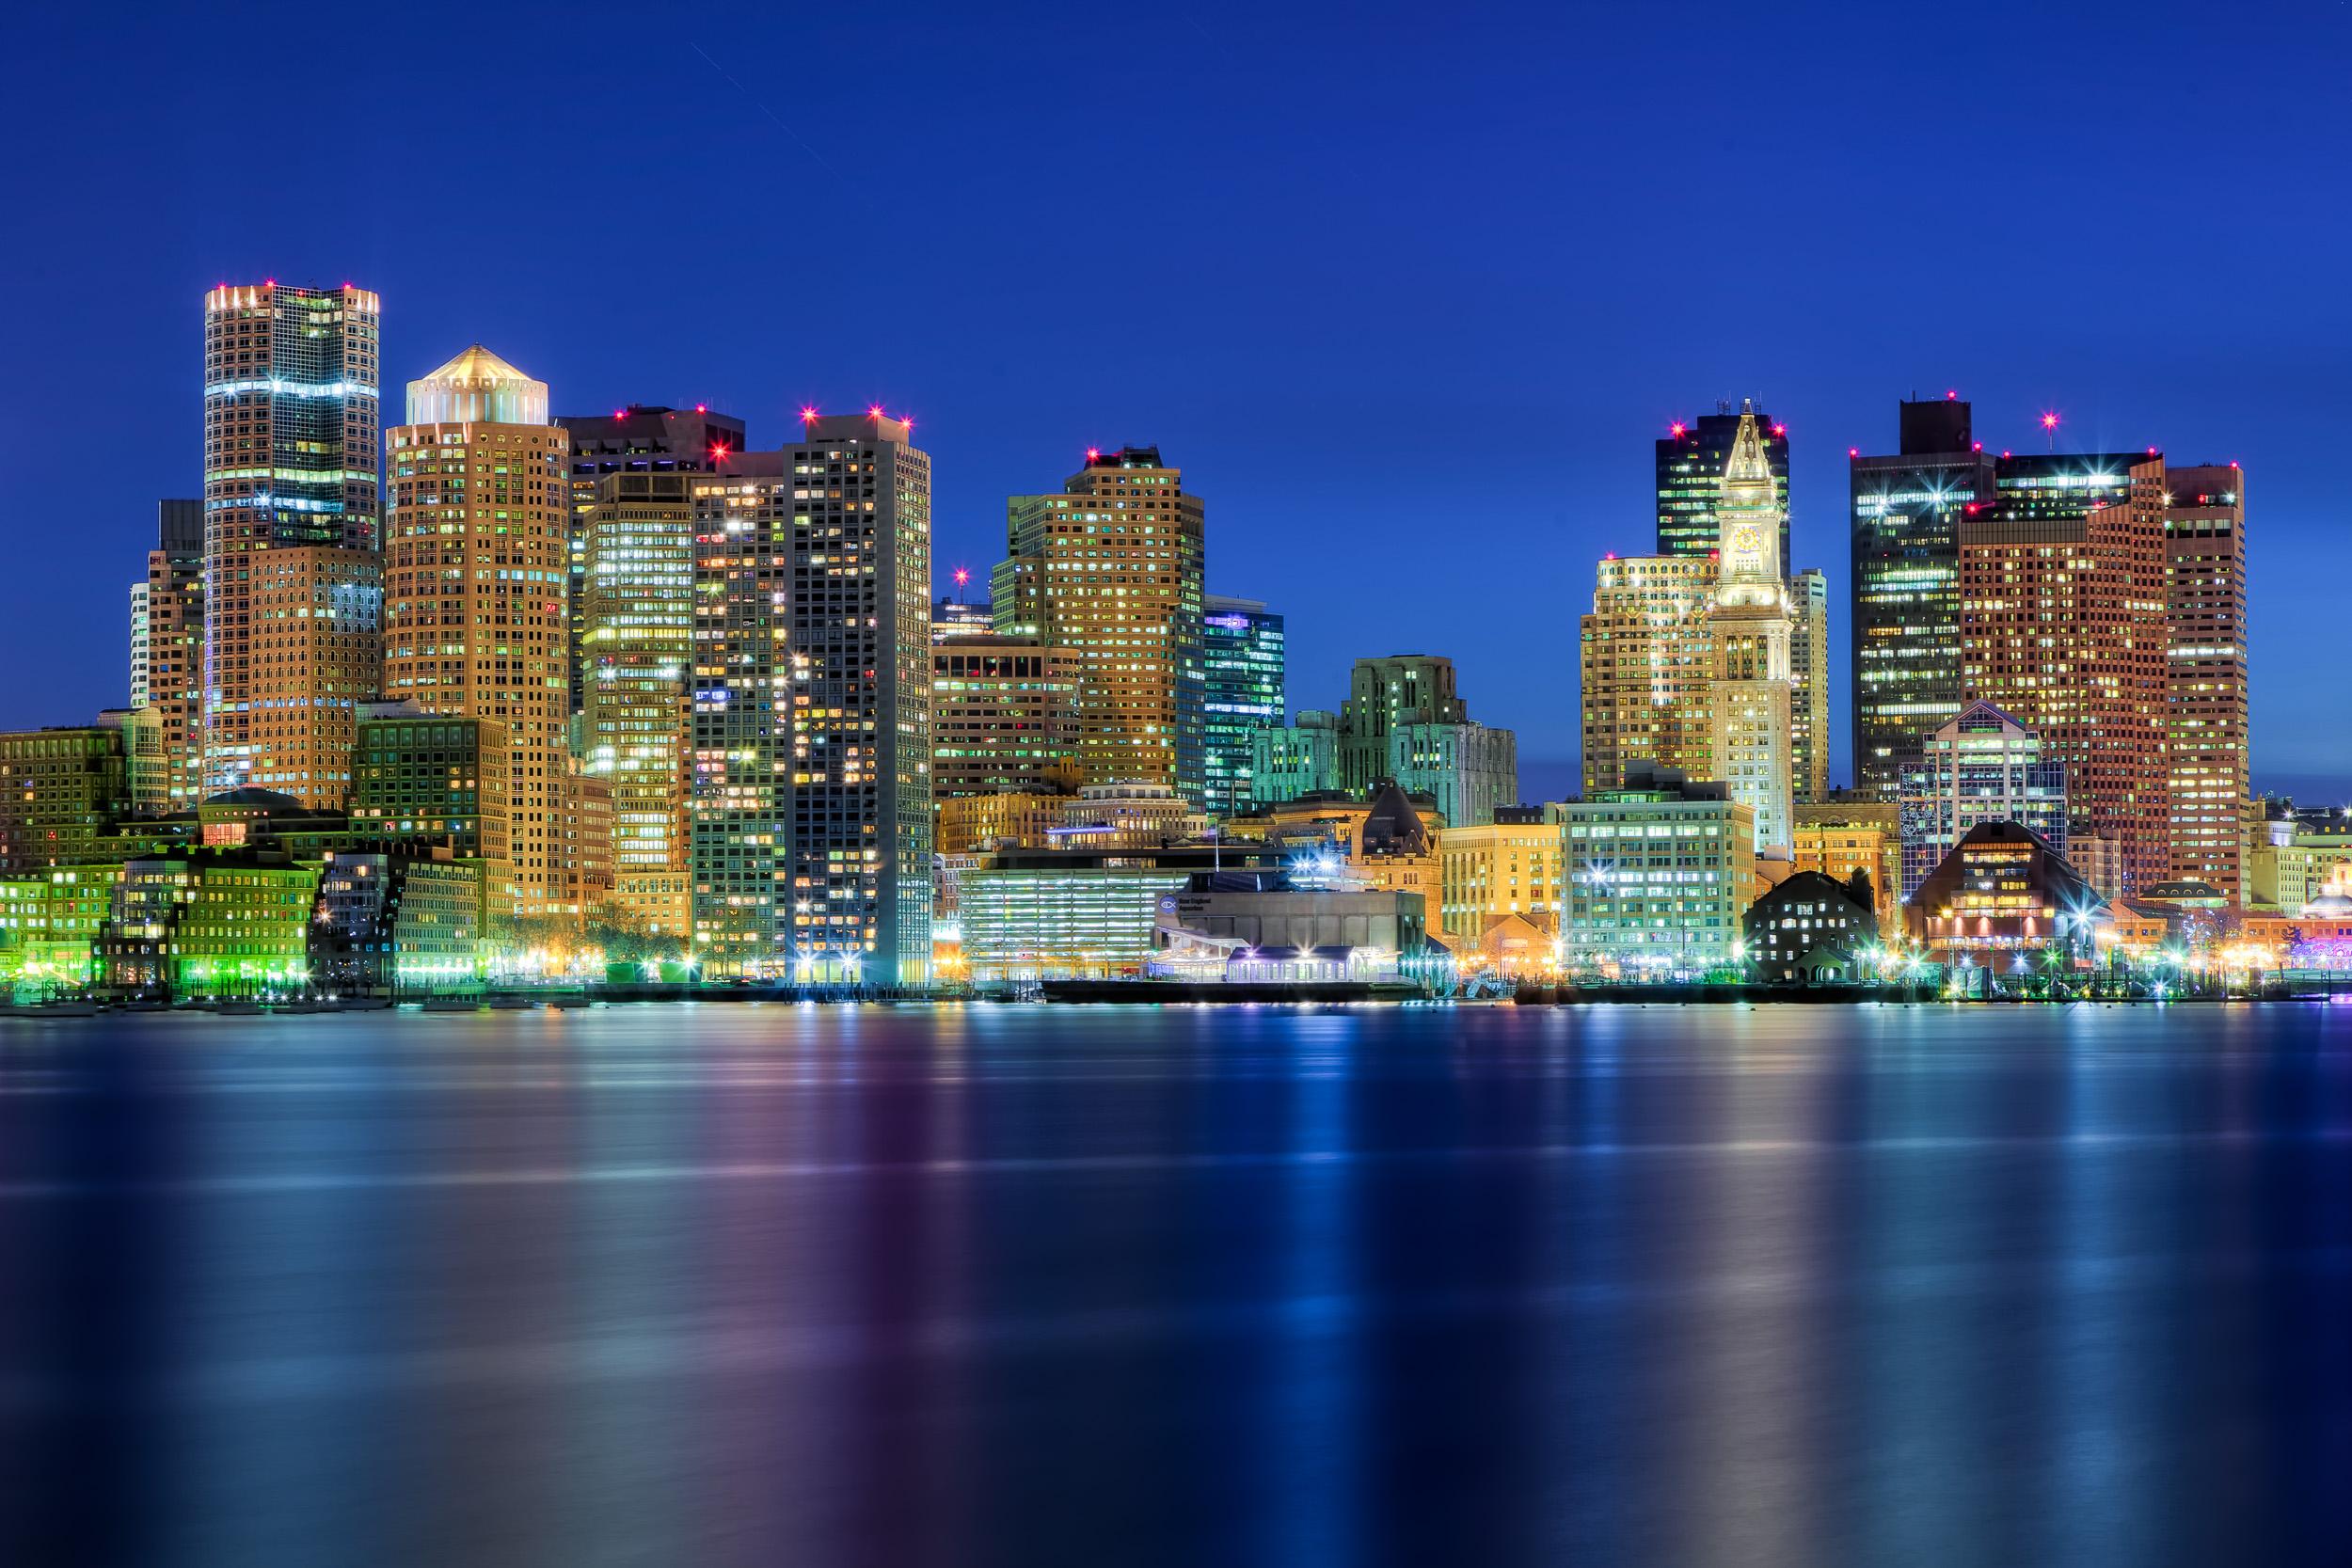 Boston_from_Piers_Park_Miami_Fort_Lauderdale_commercial_photographer_Franklin_Castillo.jpg